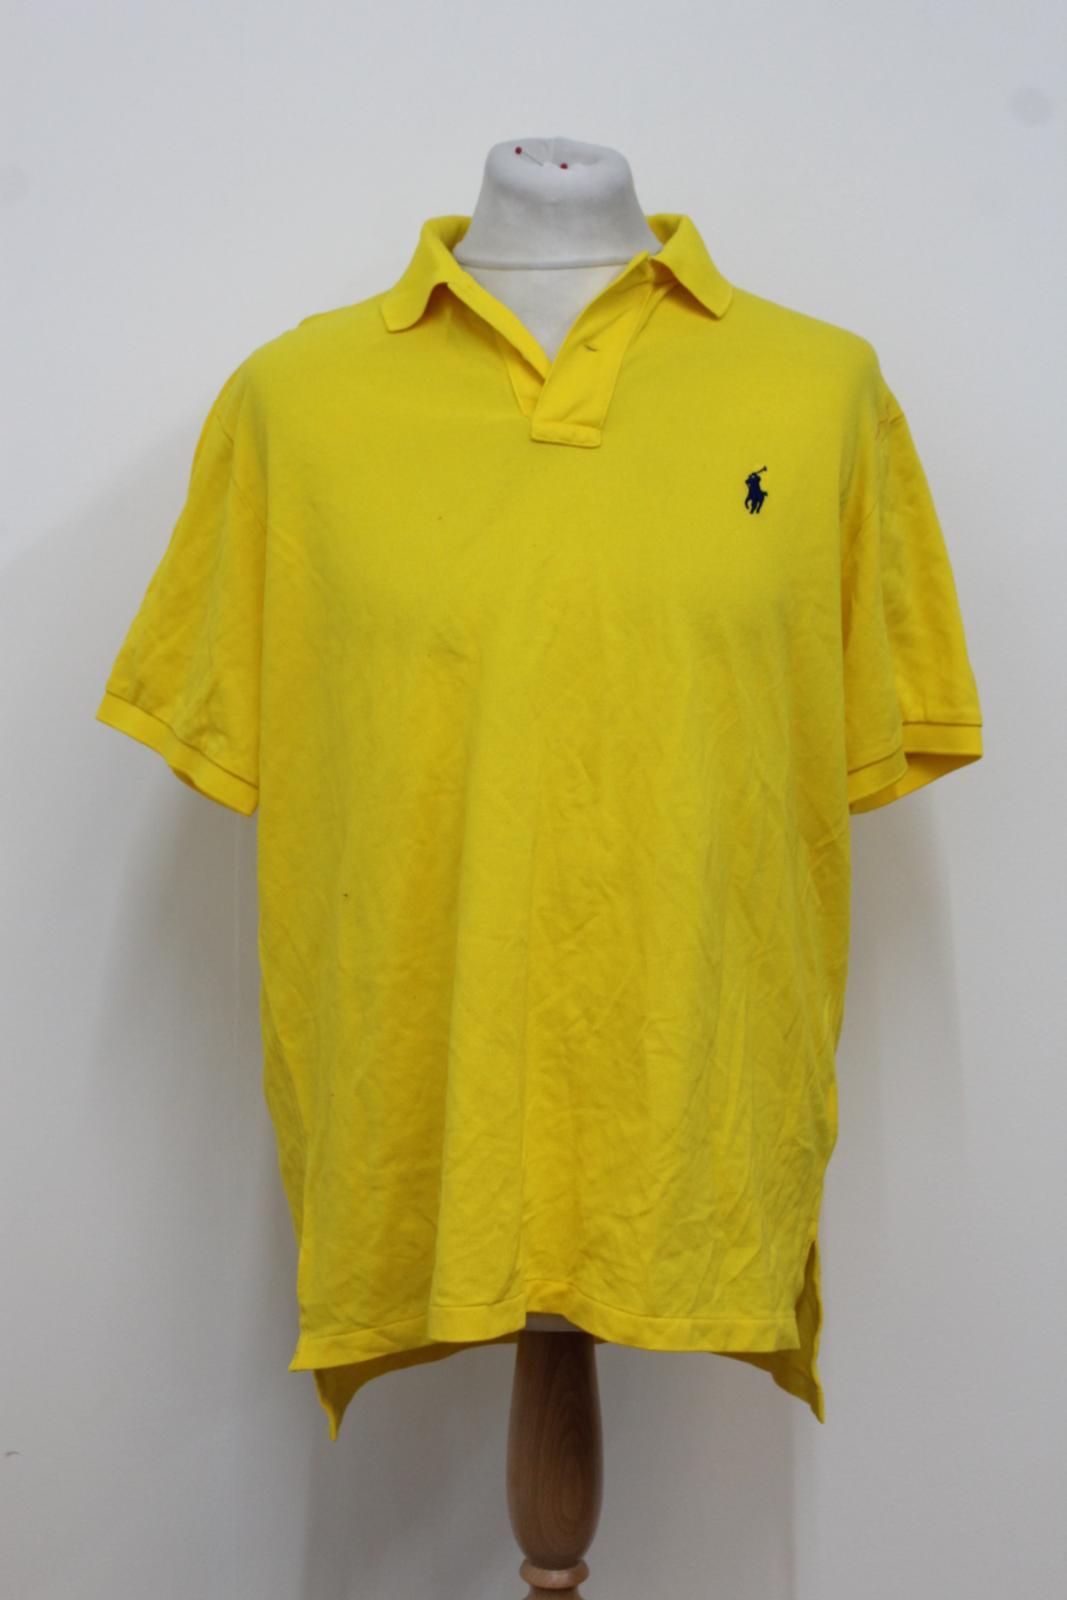 Ralph-Lauren-Polo-para-hombre-de-Amarillo-De-Algodon-Manga-Corta-Camisa-Polo-De-Ajuste-Personalizado miniatura 2